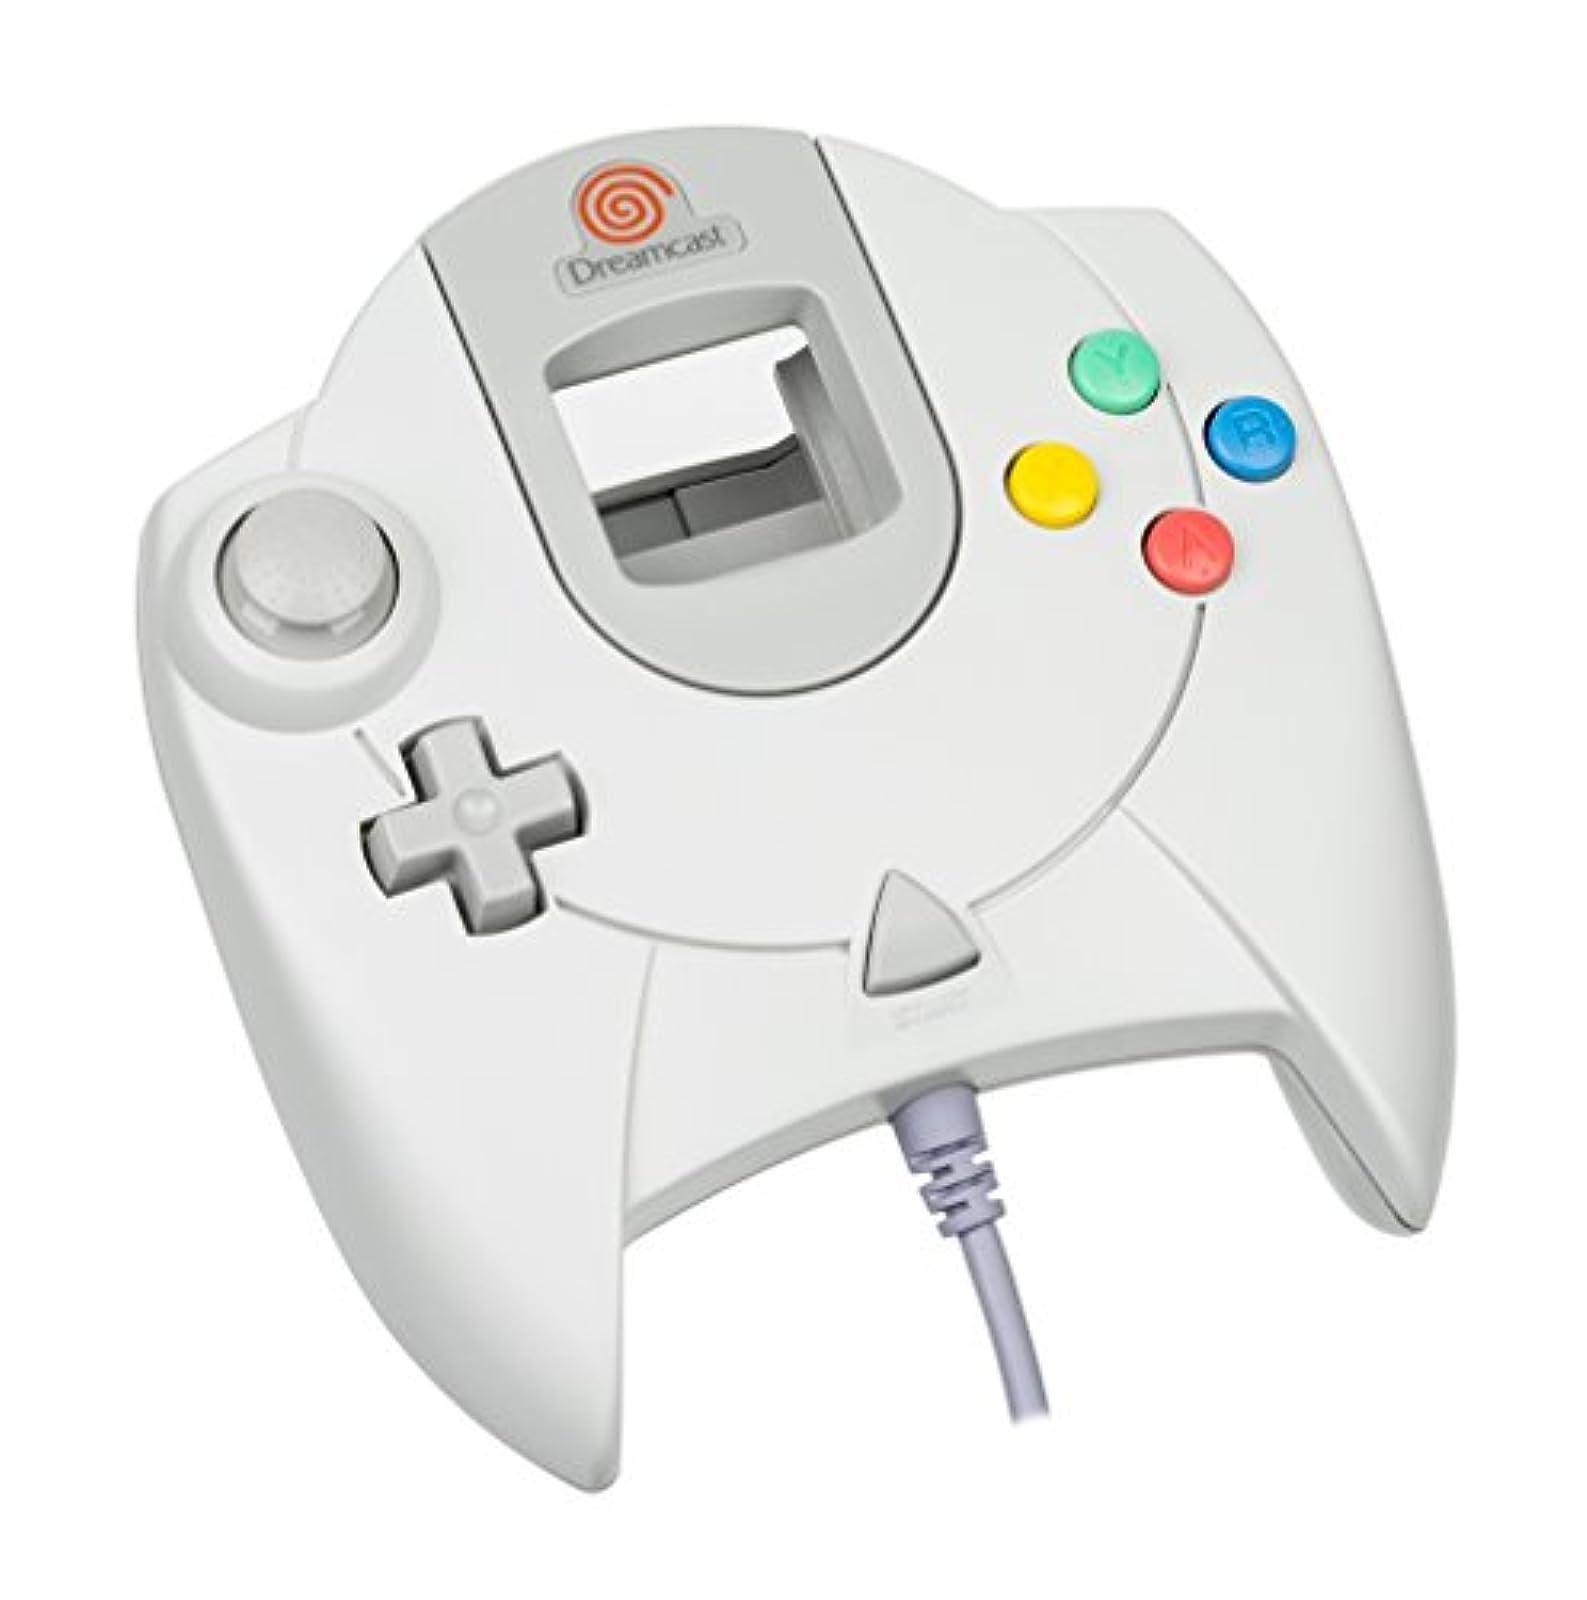 Official Sega Dreamcast OEM Controller Dreamcast